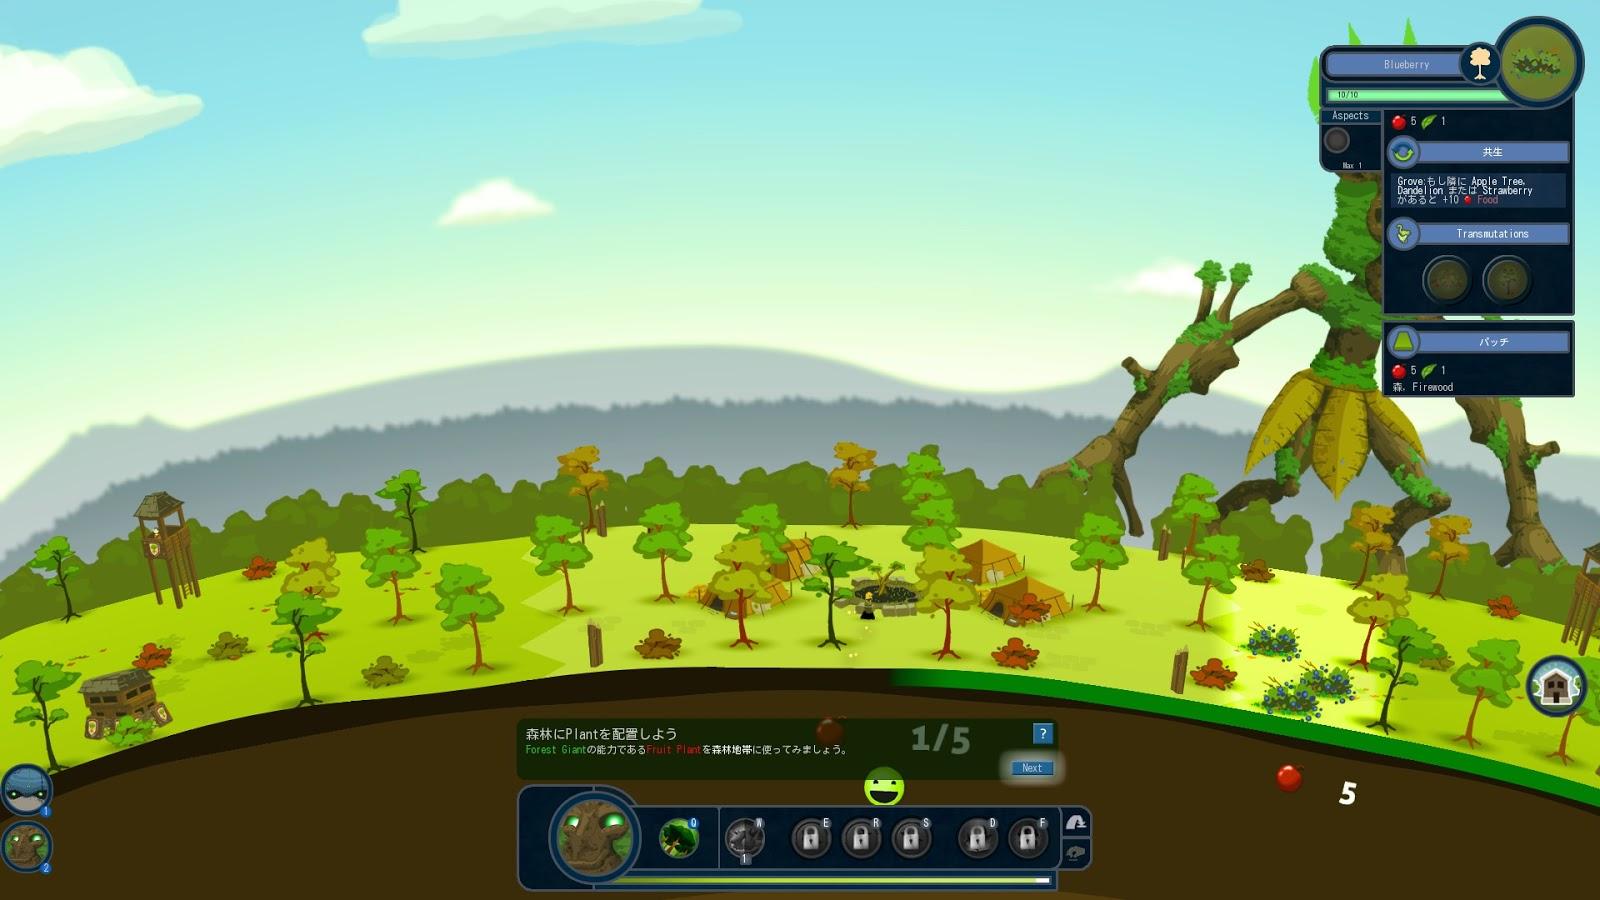 Kk pp s butsuyoku gamers life reus voltagebd Choice Image